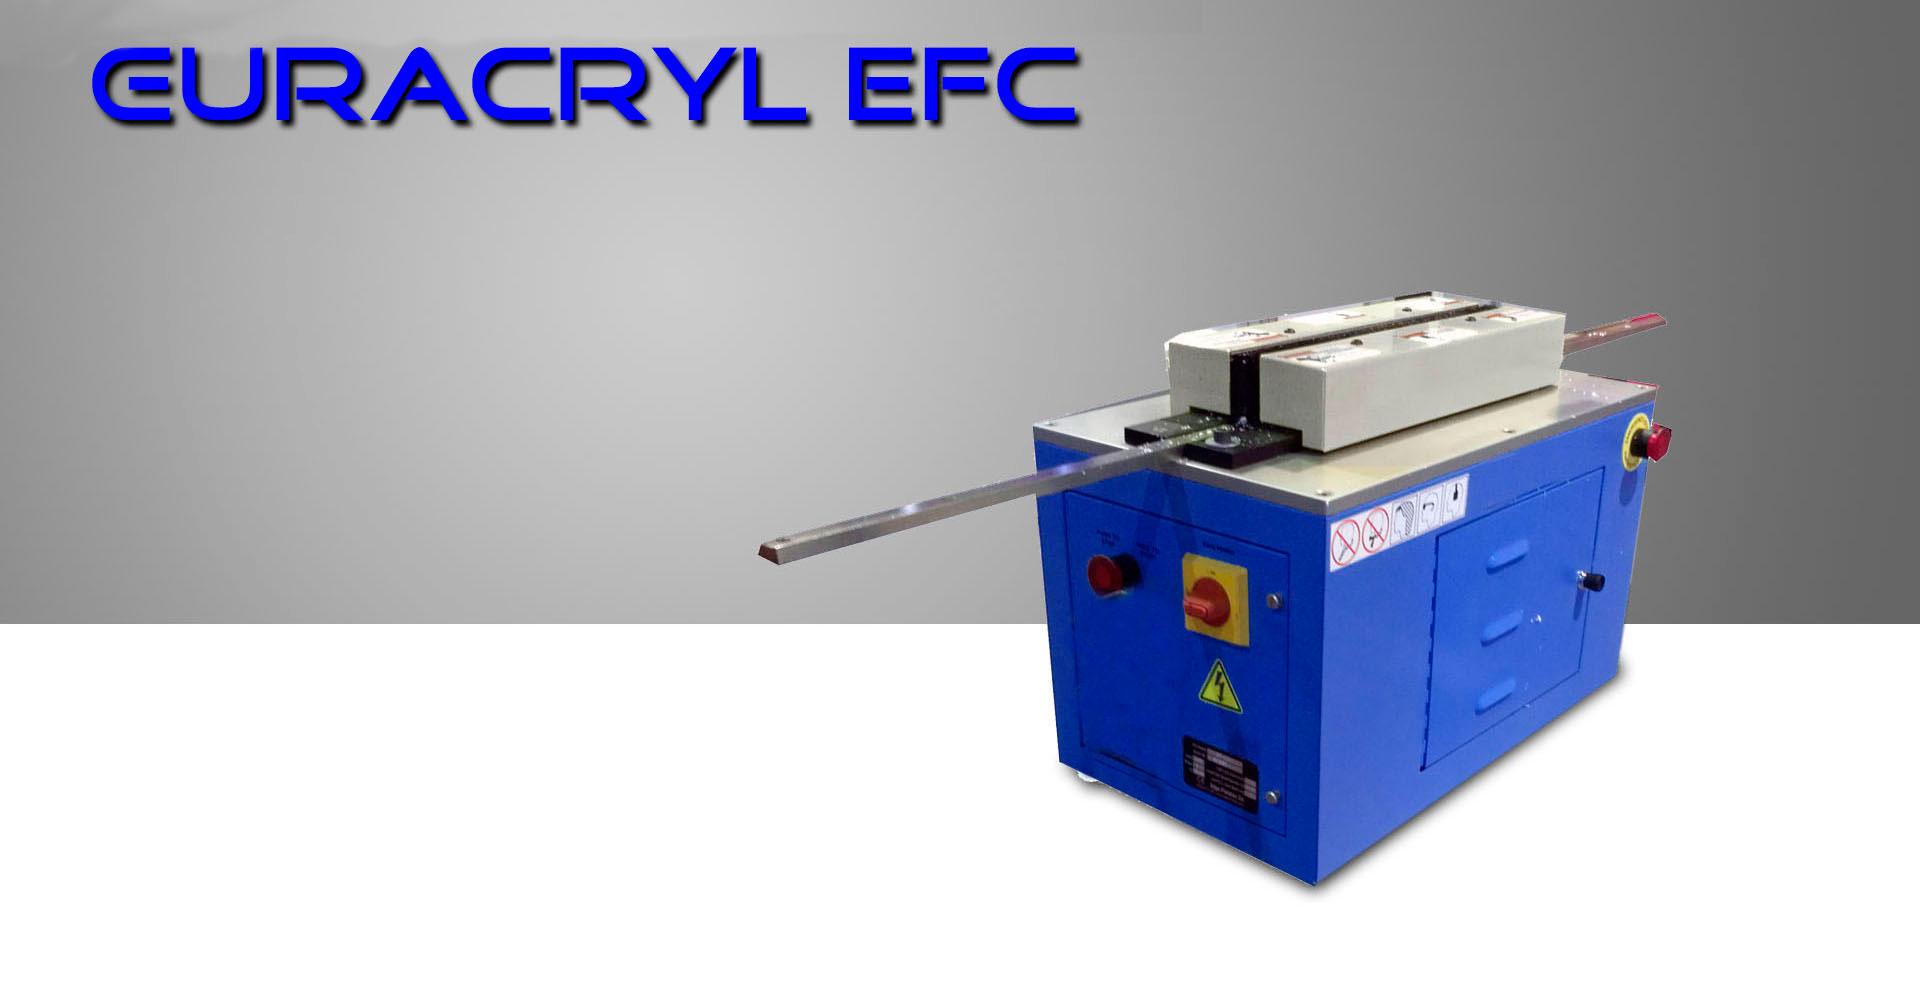 Pulidora de cantos vertical EFC Euracryl